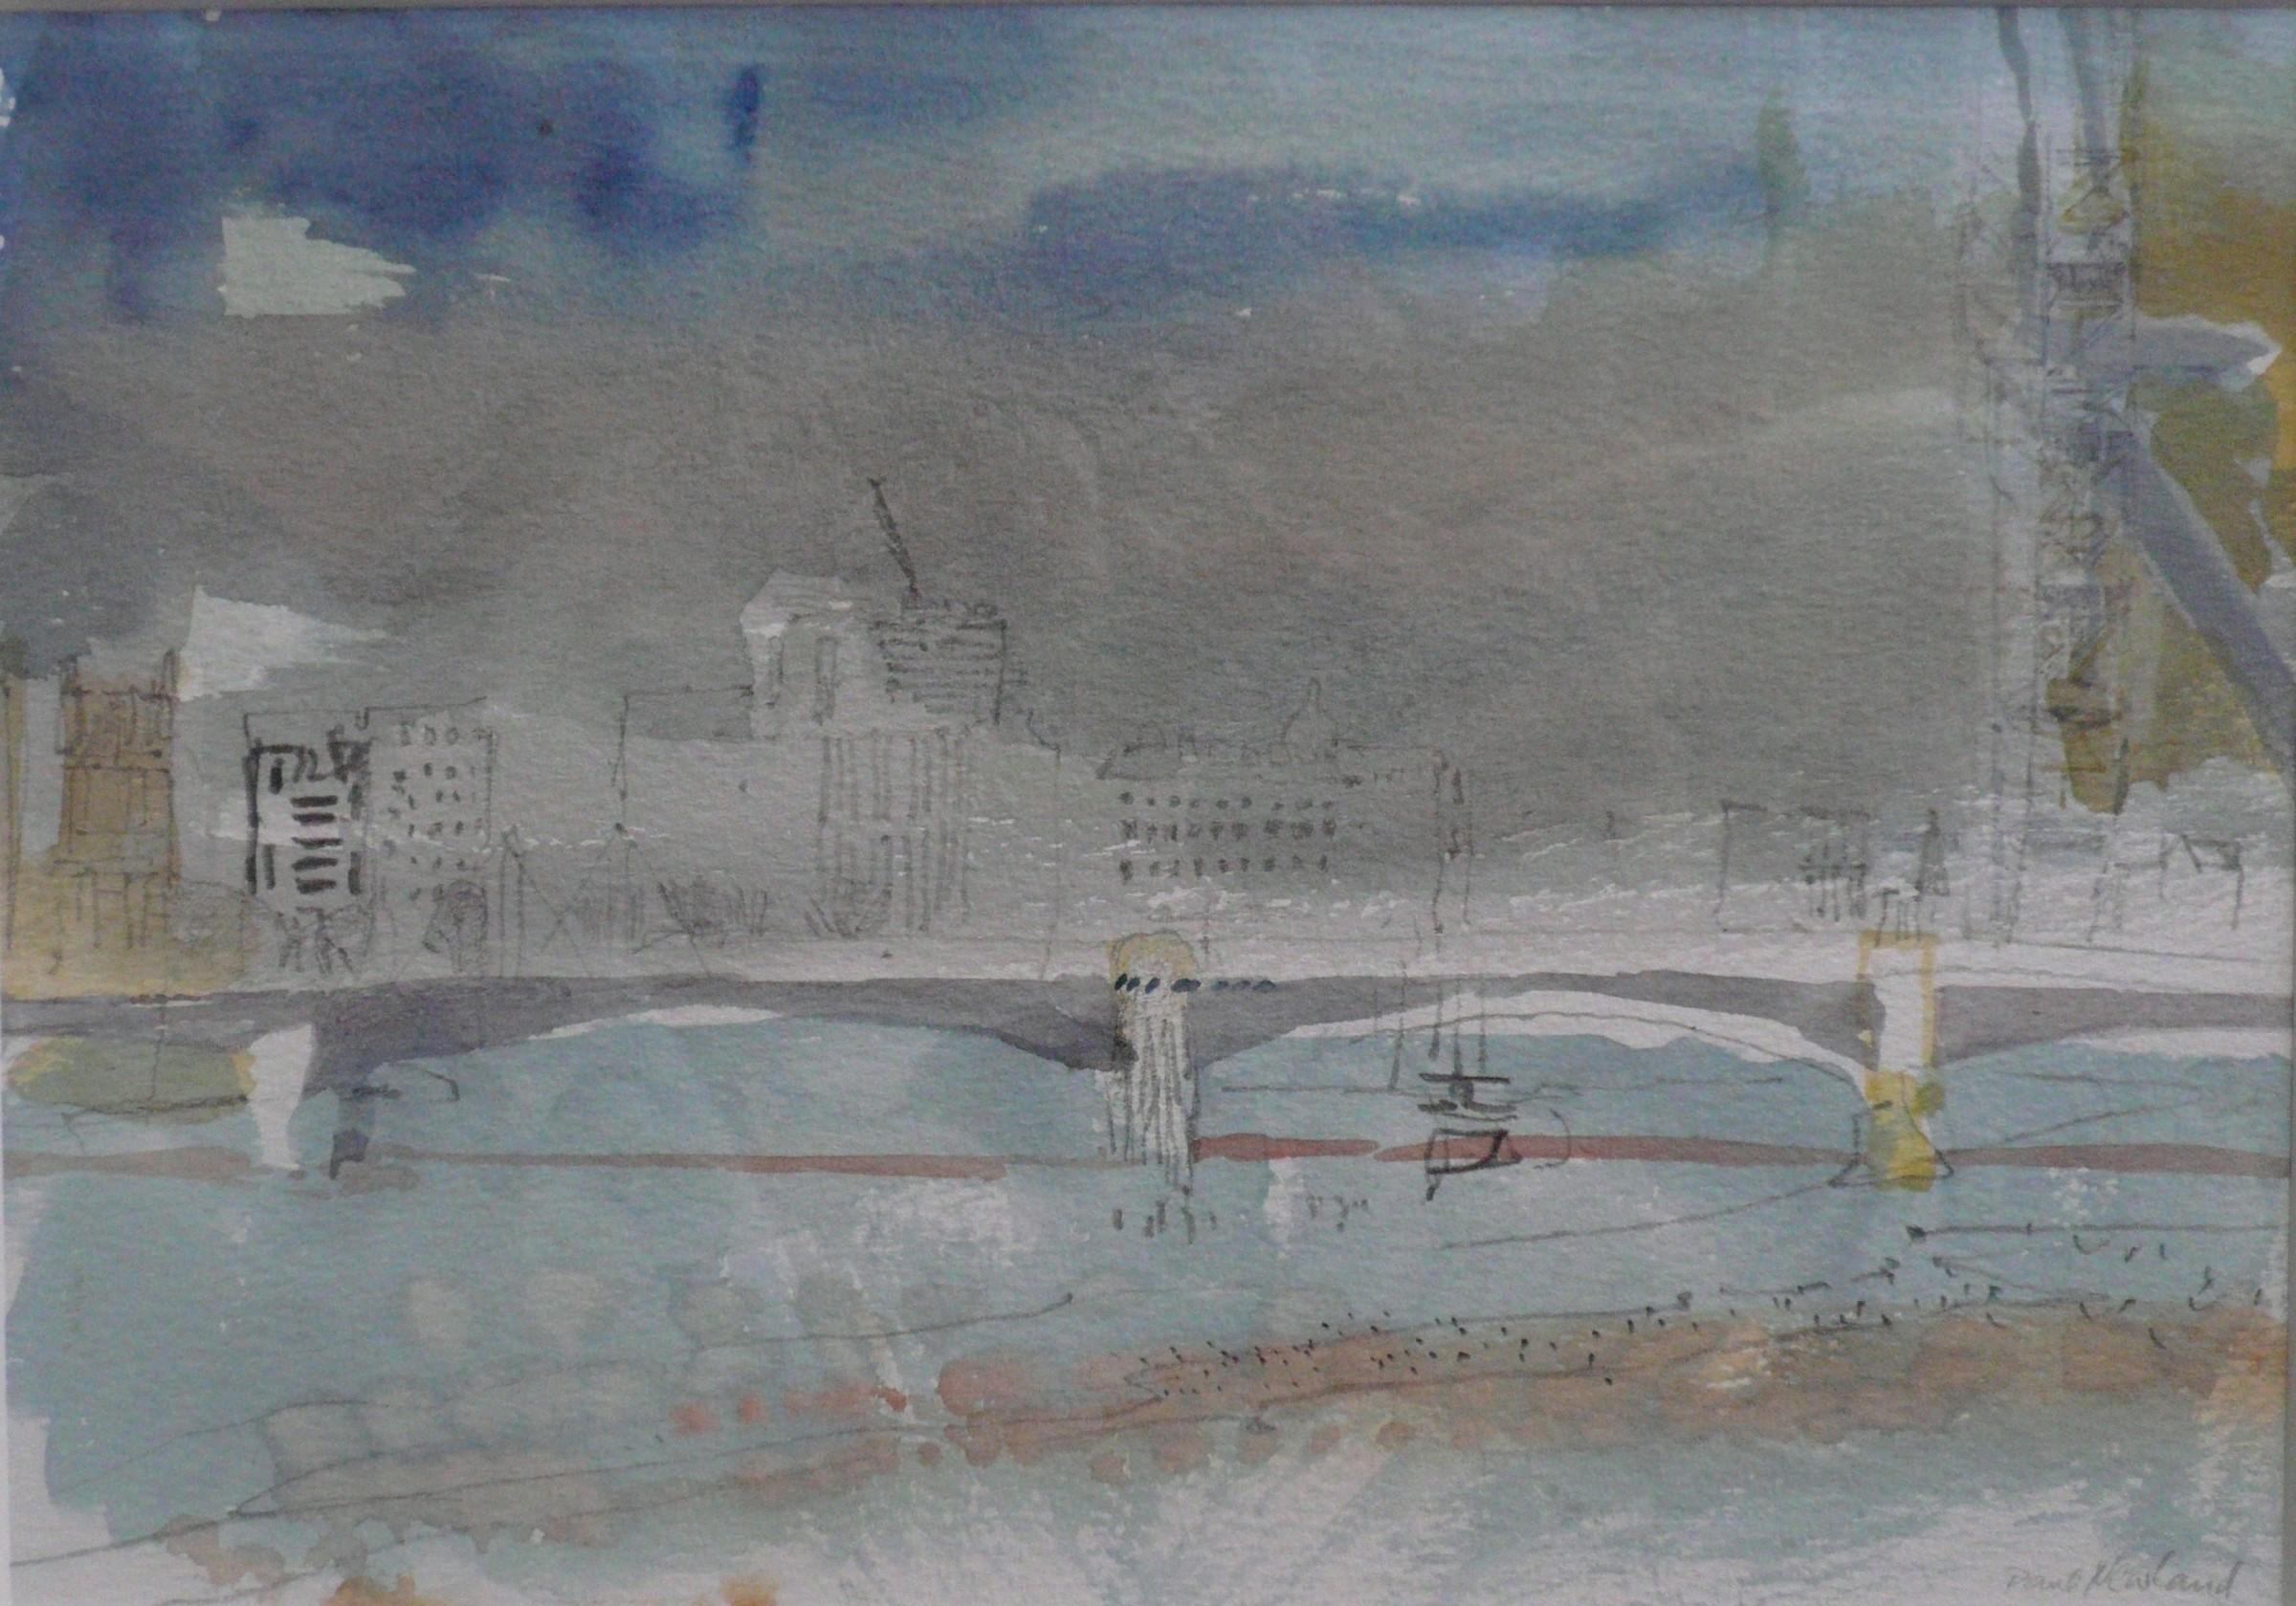 <span class=&#34;link fancybox-details-link&#34;><a href=&#34;/artists/87-paul-newland/works/10062-paul-newland-river-bridge-haze/&#34;>View Detail Page</a></span><div class=&#34;artist&#34;><span class=&#34;artist&#34;><strong>Paul Newland</strong></span></div><div class=&#34;title&#34;><em>River, Bridge, Haze</em></div><div class=&#34;medium&#34;>watercolour</div>